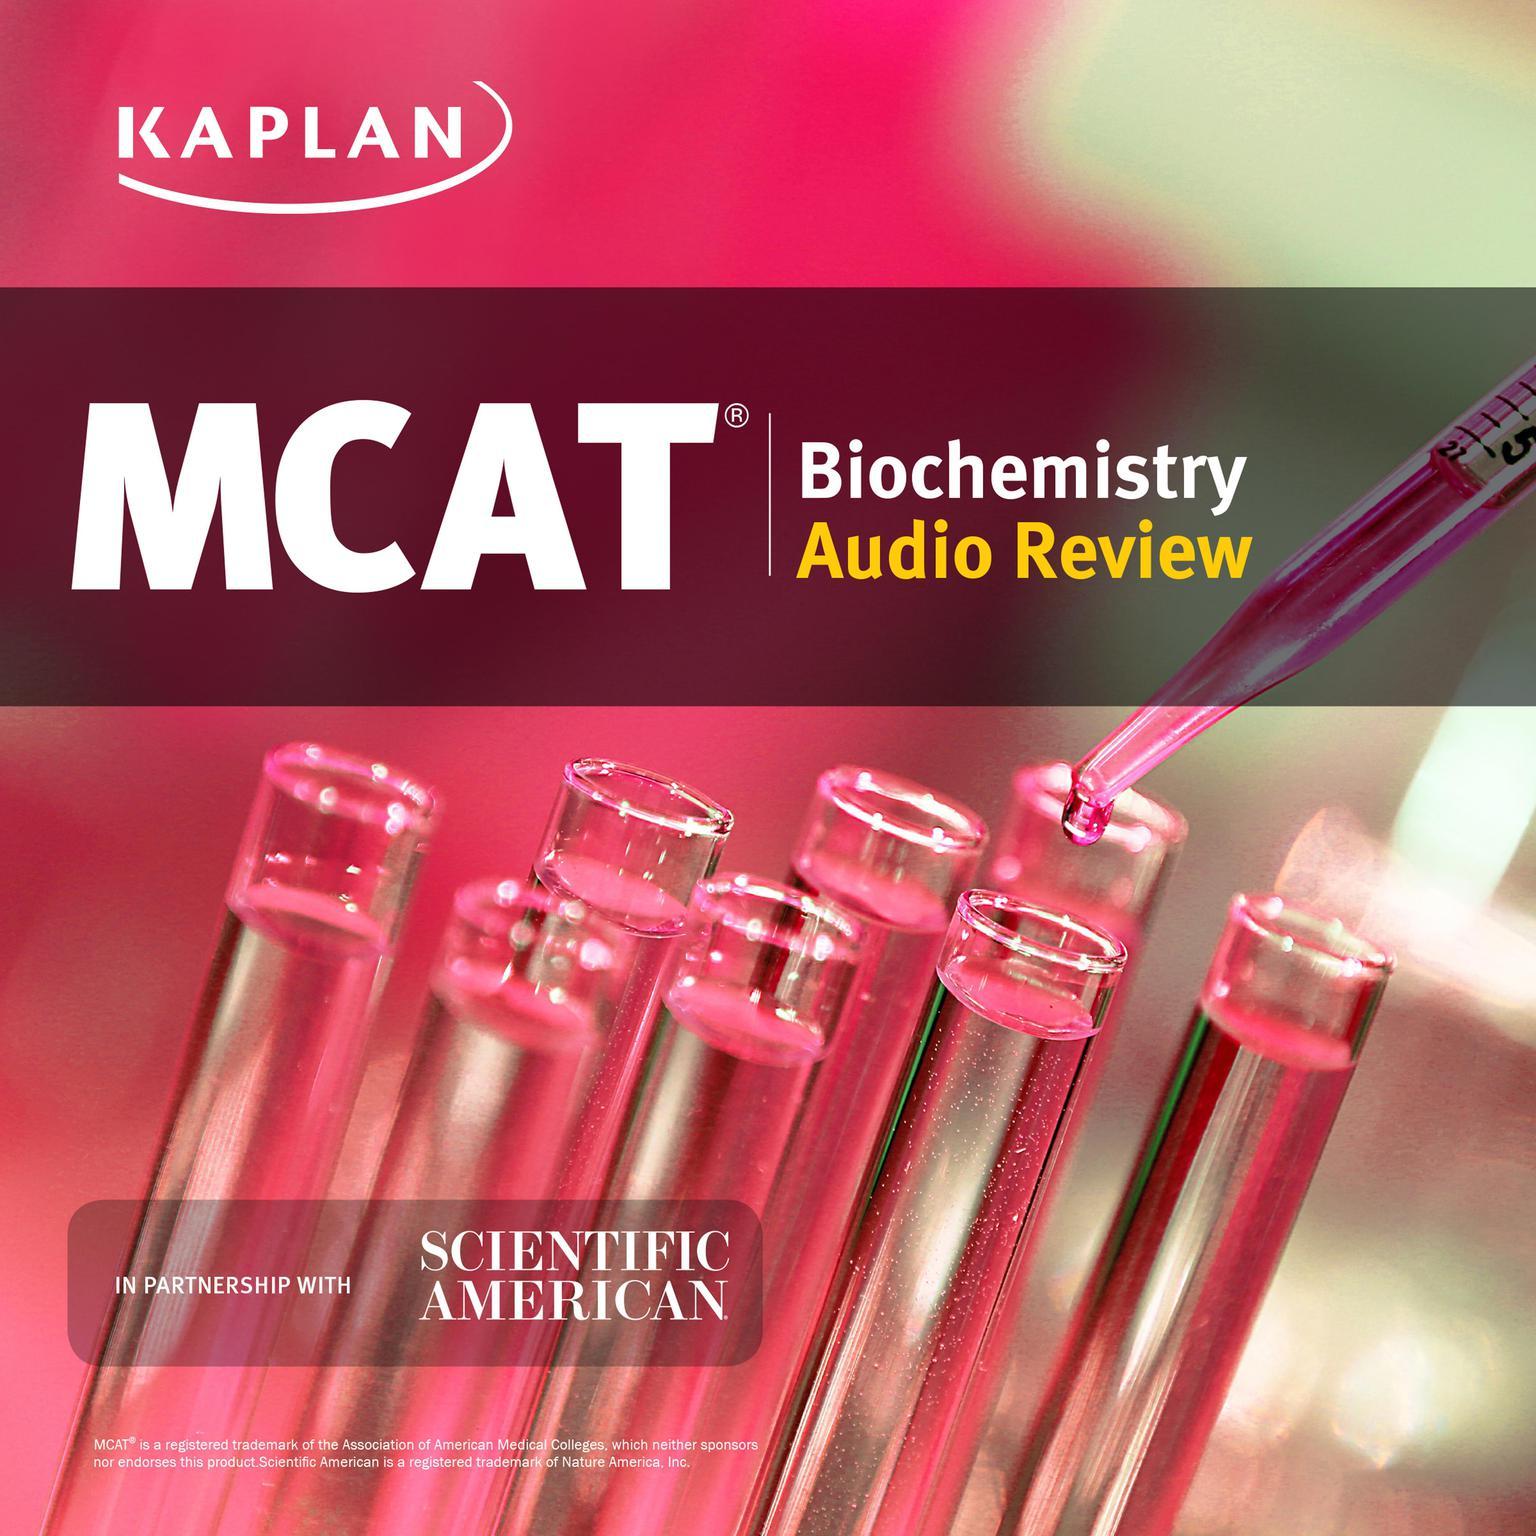 Kaplan MCAT Biochemistry Audio Review (Abridged) Audiobook, by Jeffrey Koetje